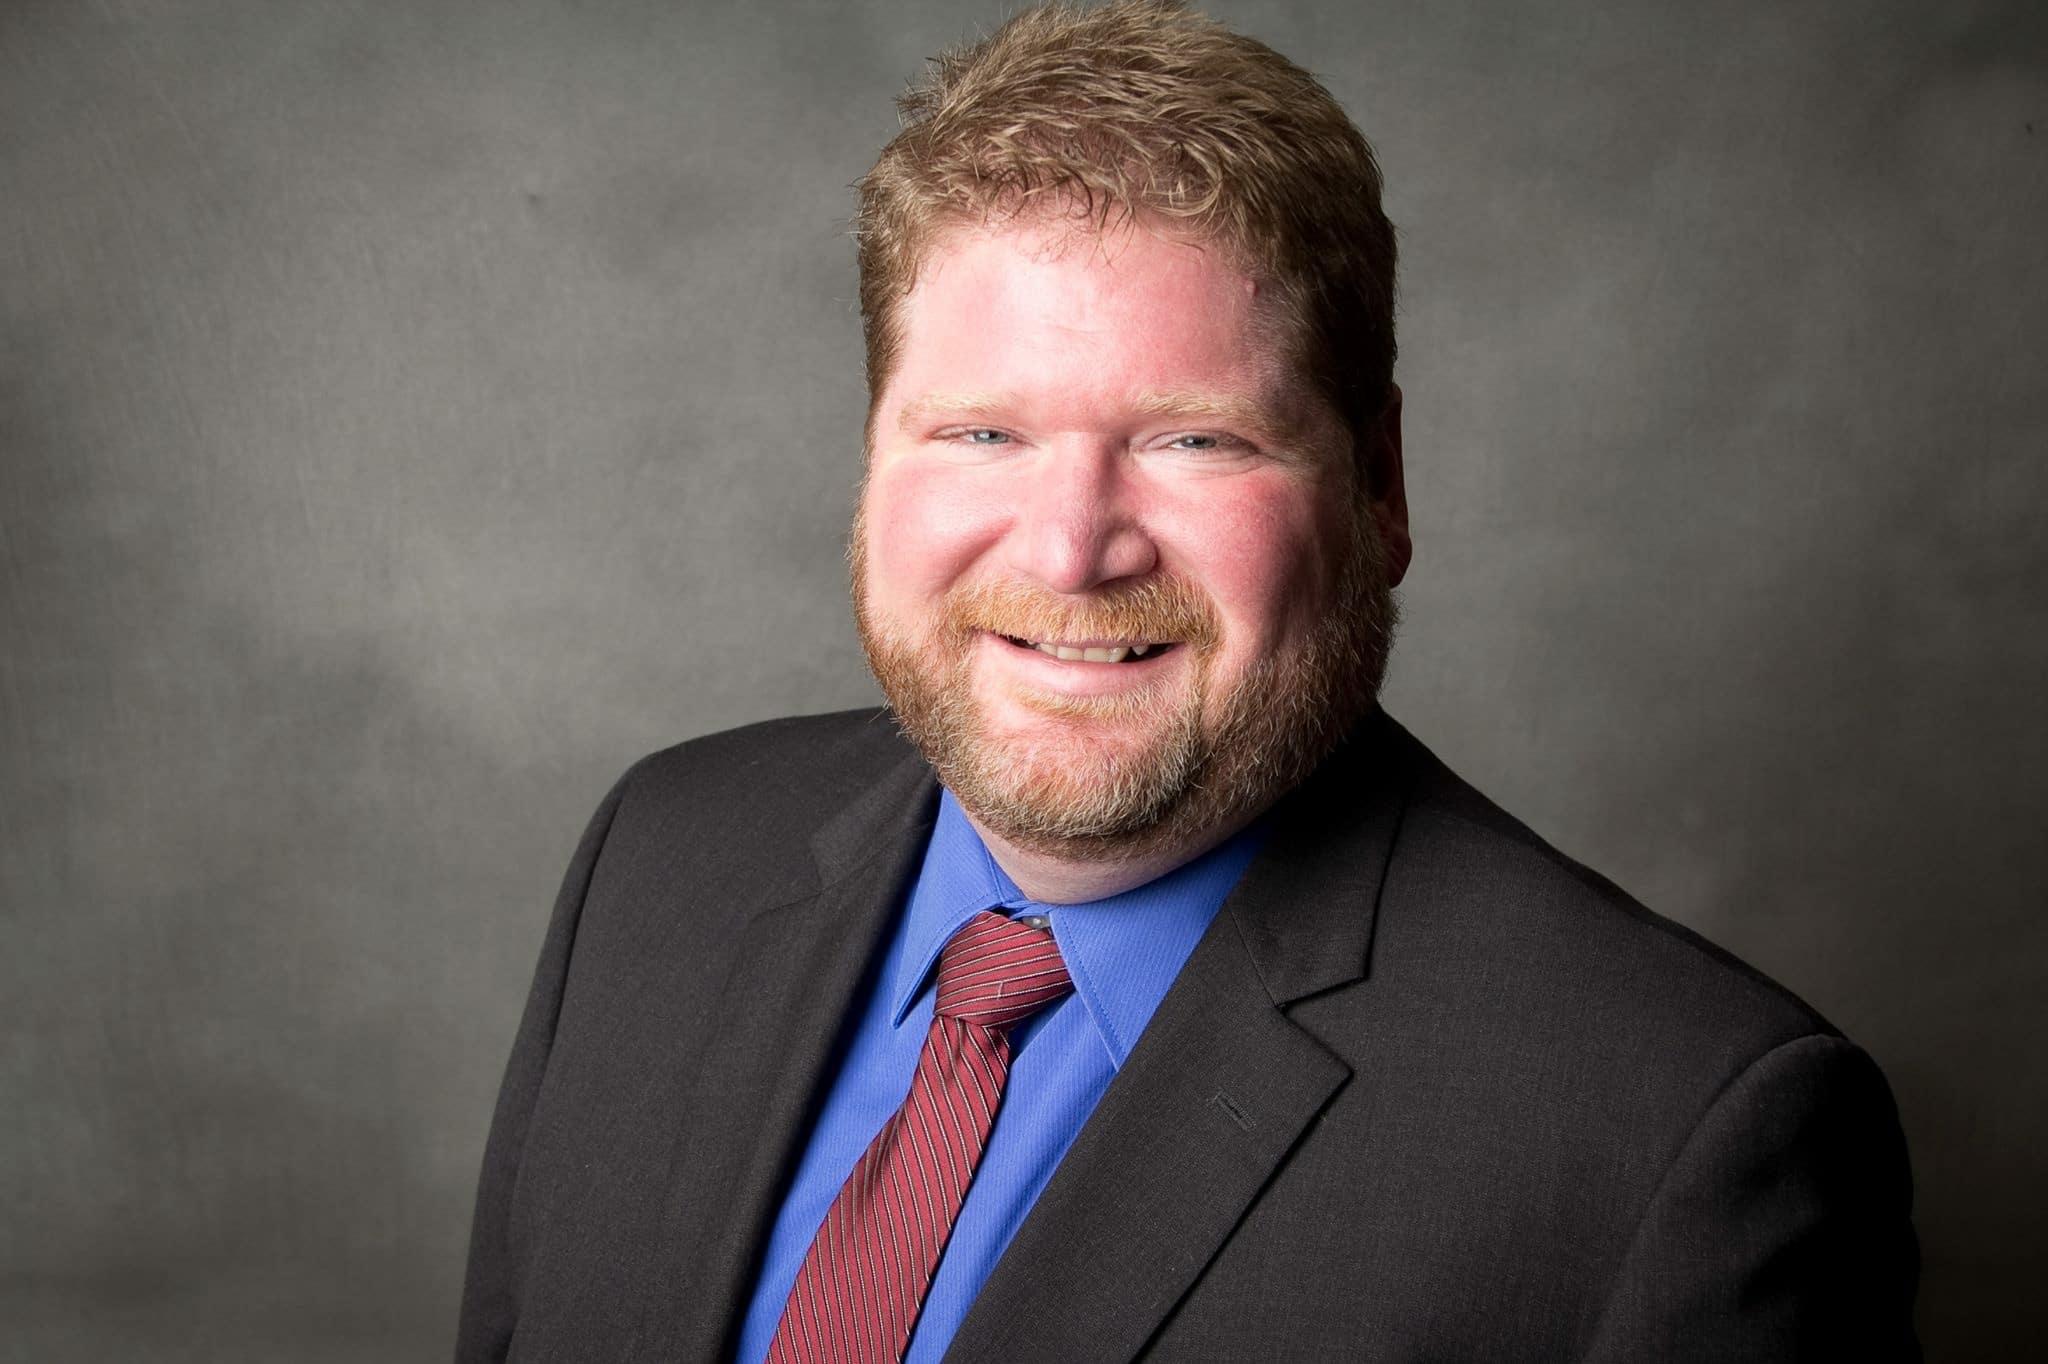 Eric Nanneman